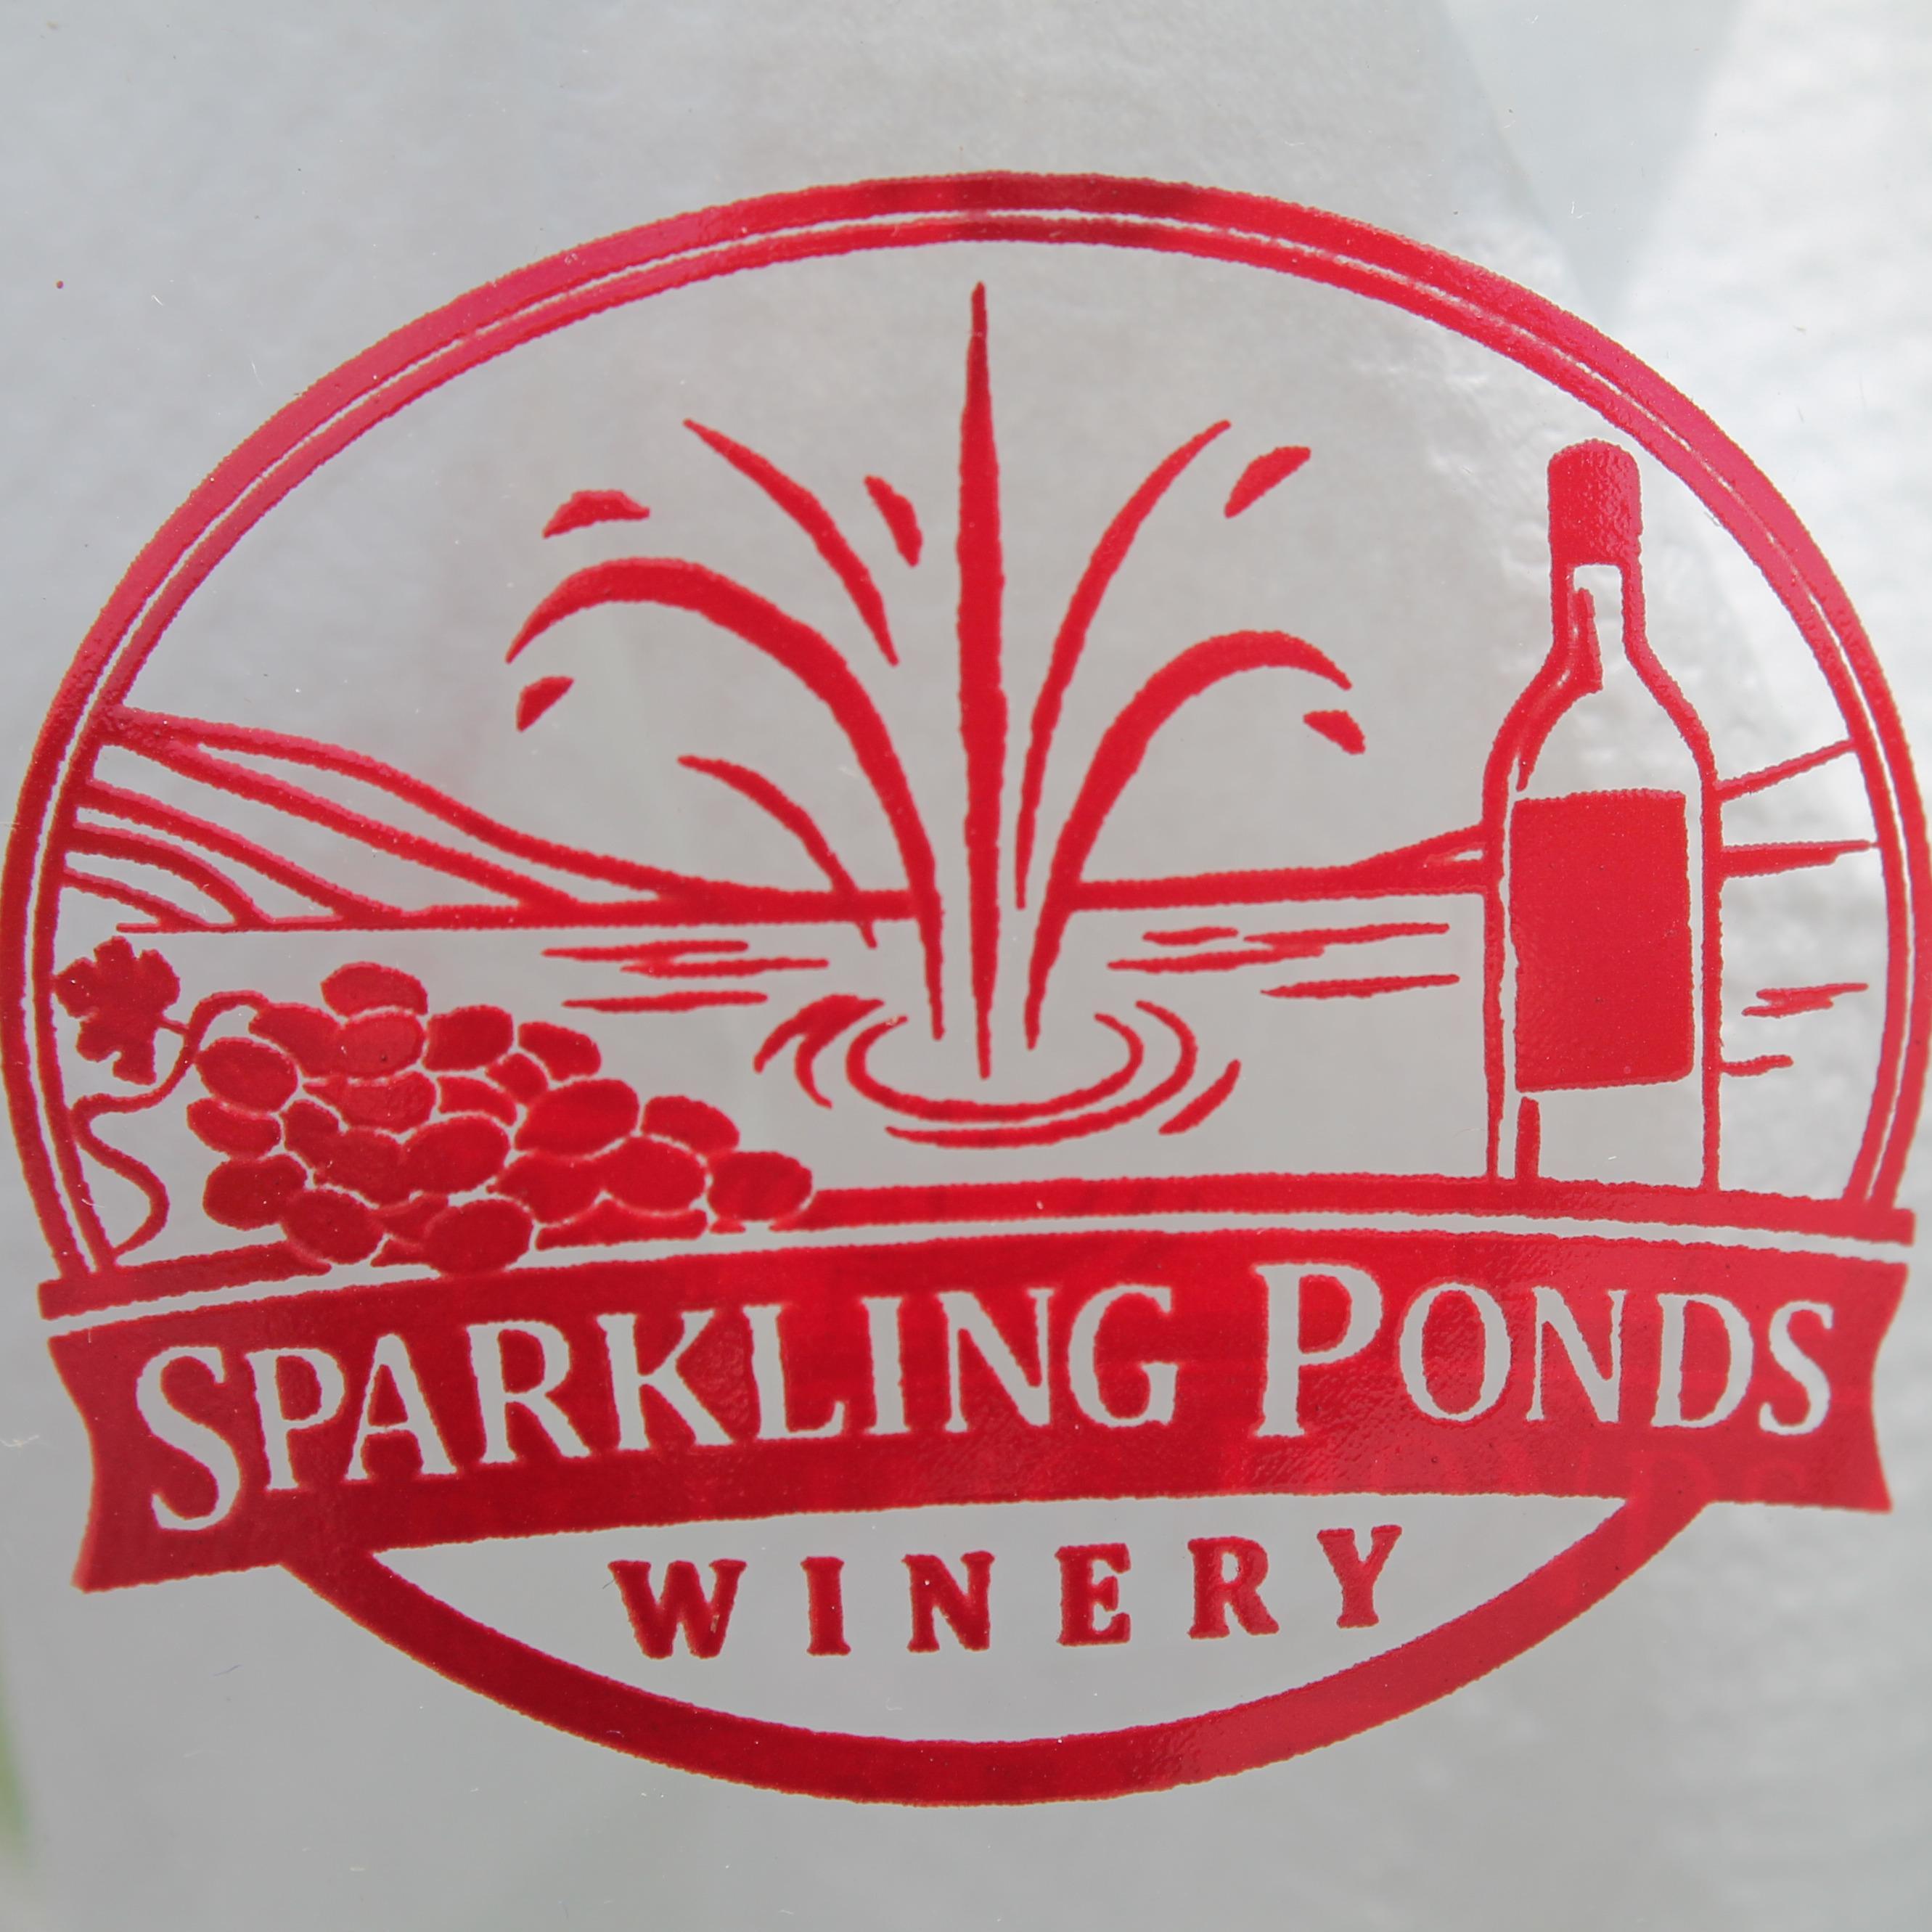 Sparkling Ponds Winery